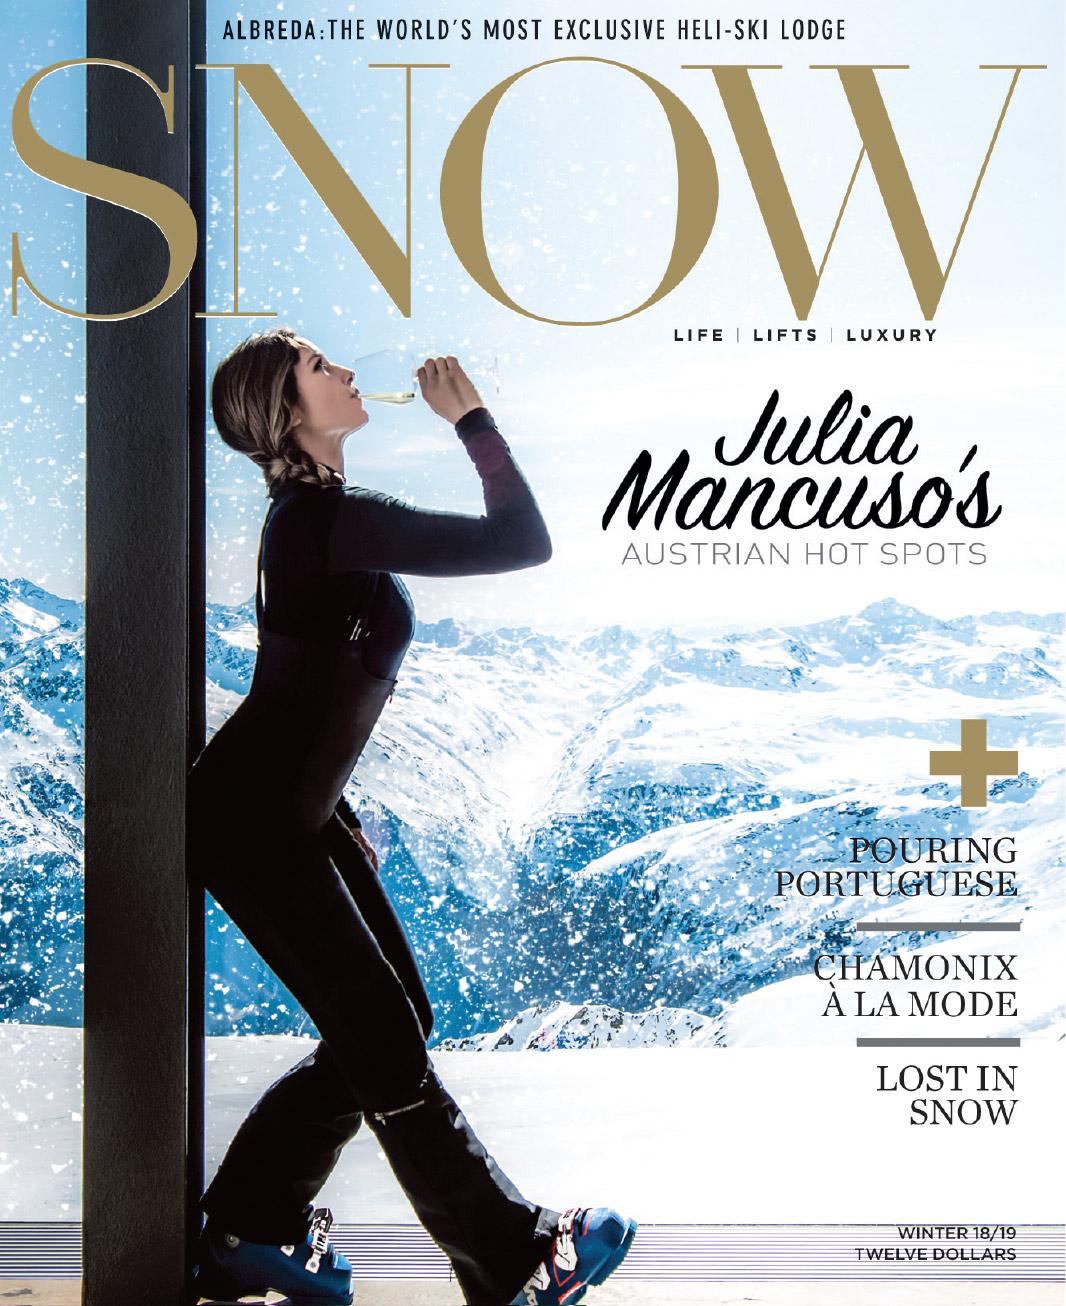 Austria---SNOW-Winter-2018-1.jpg